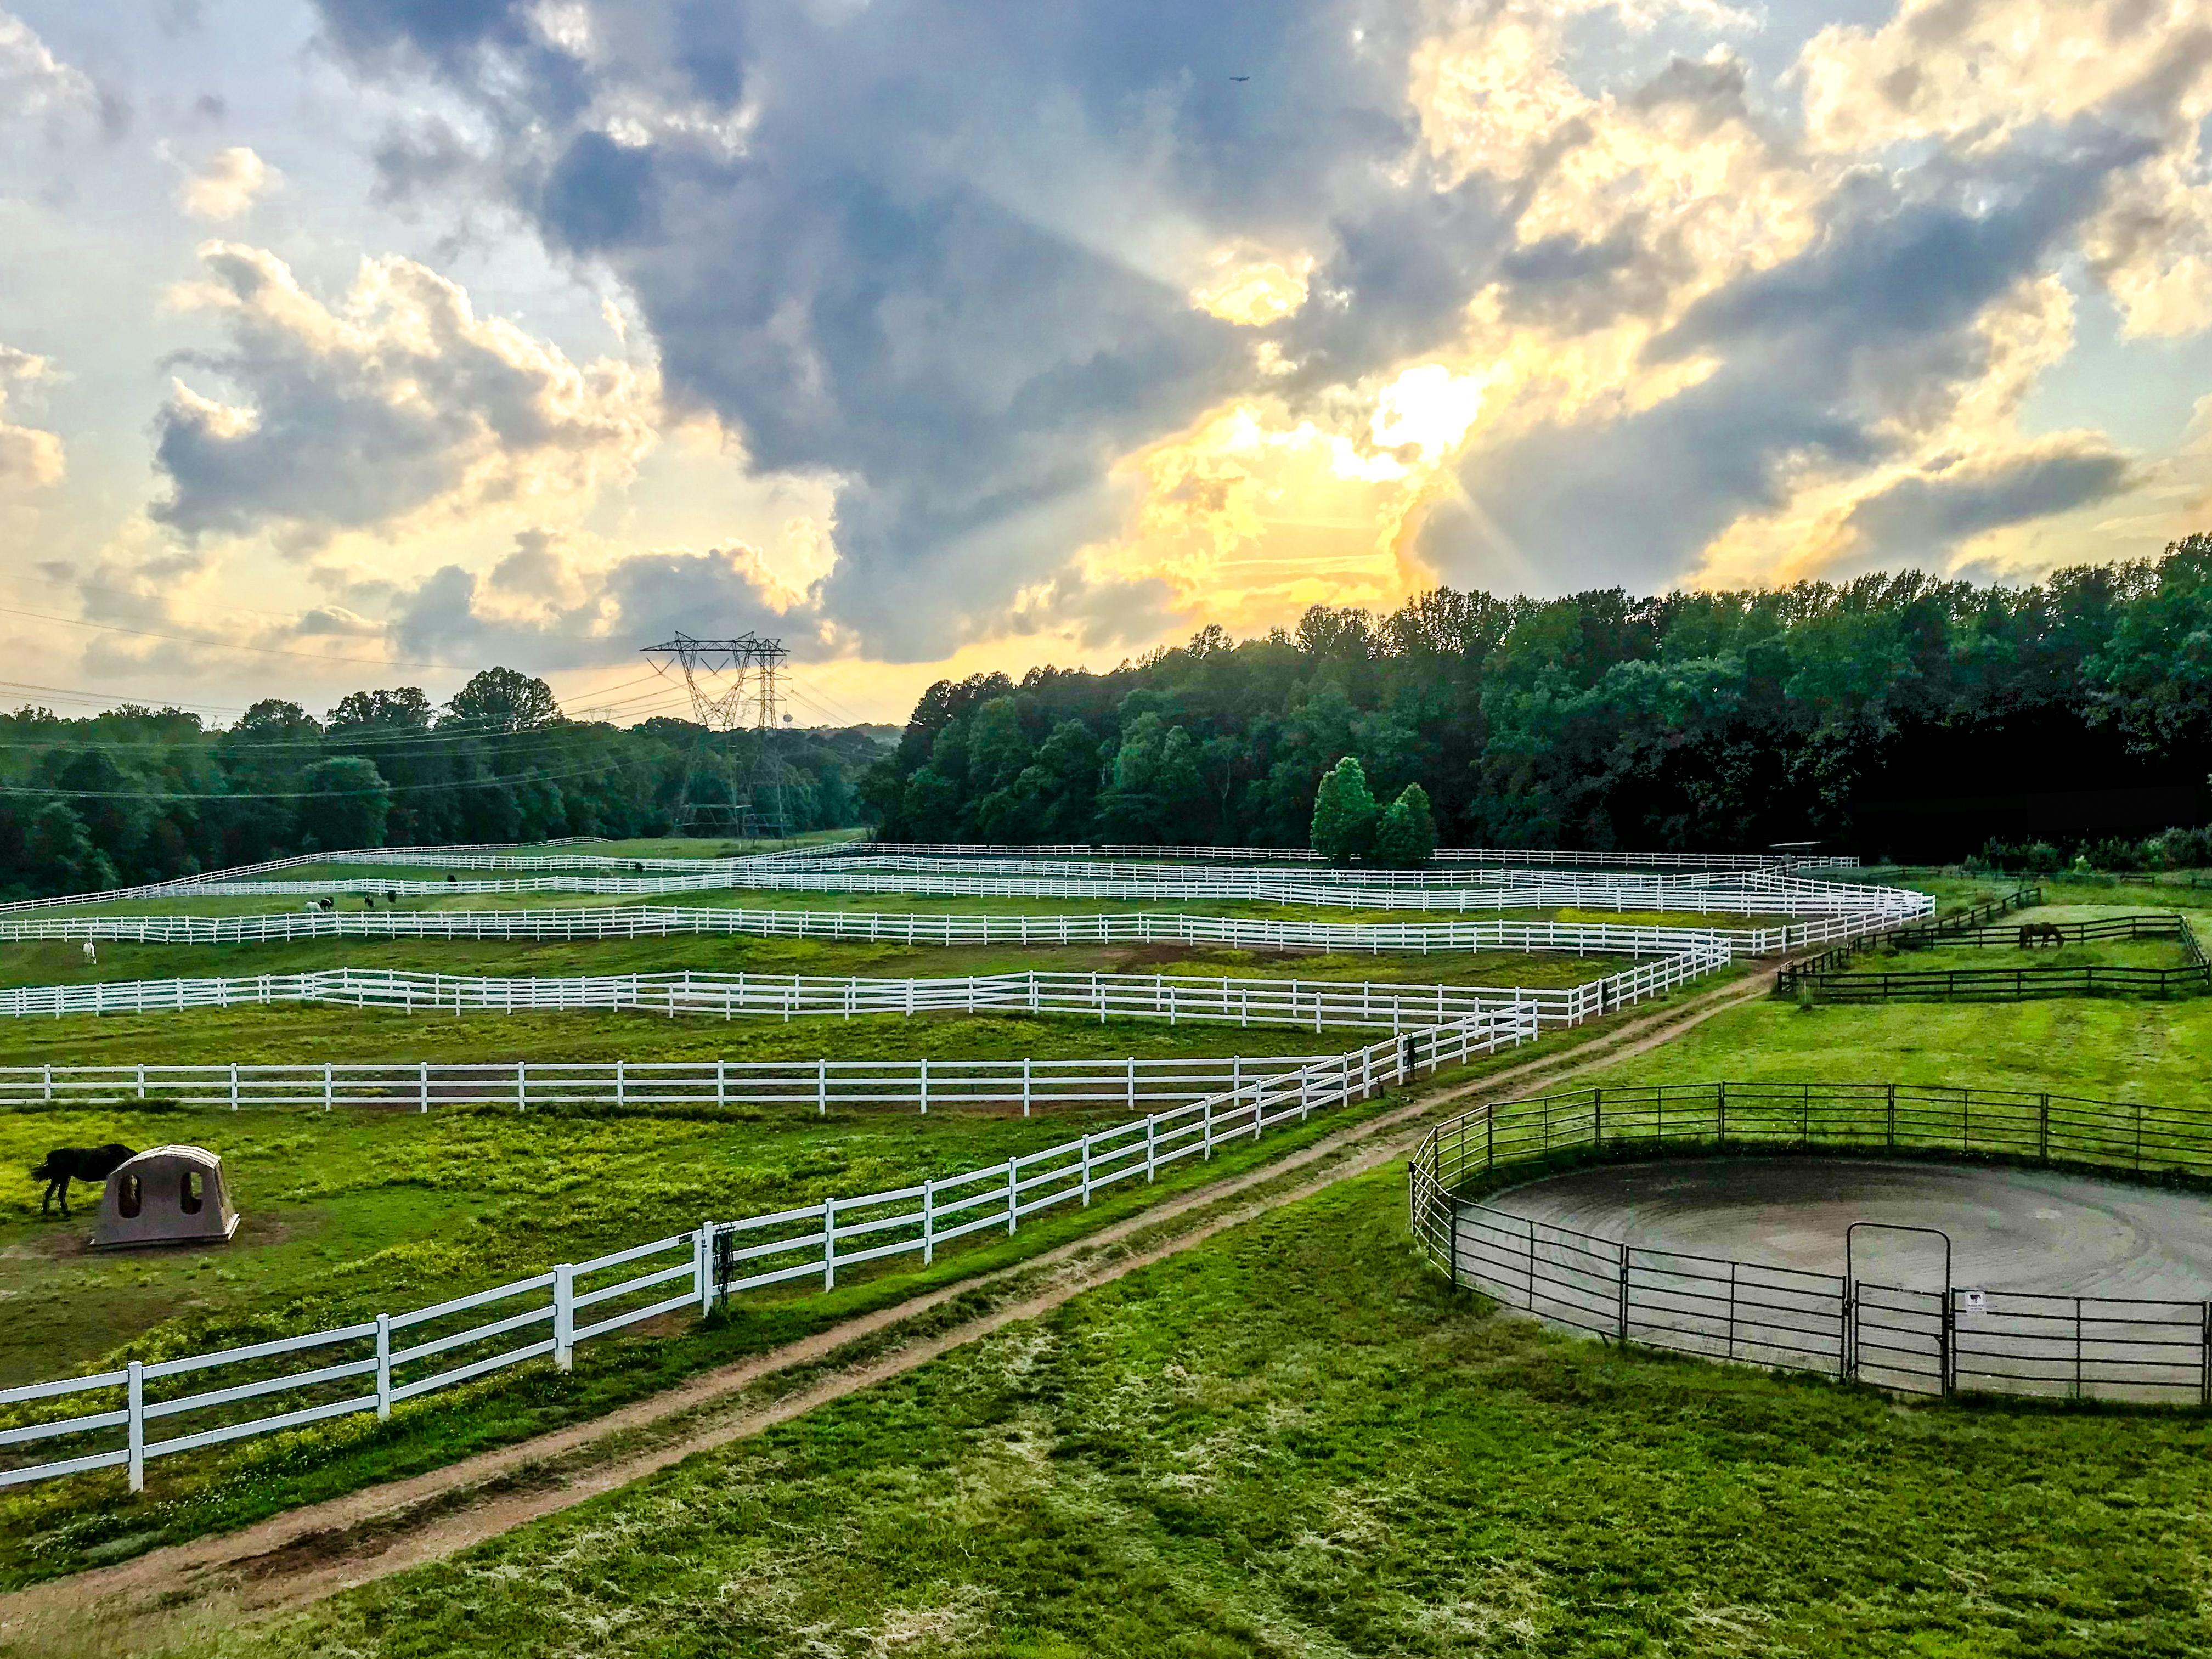 Magnolia Equestrian Center